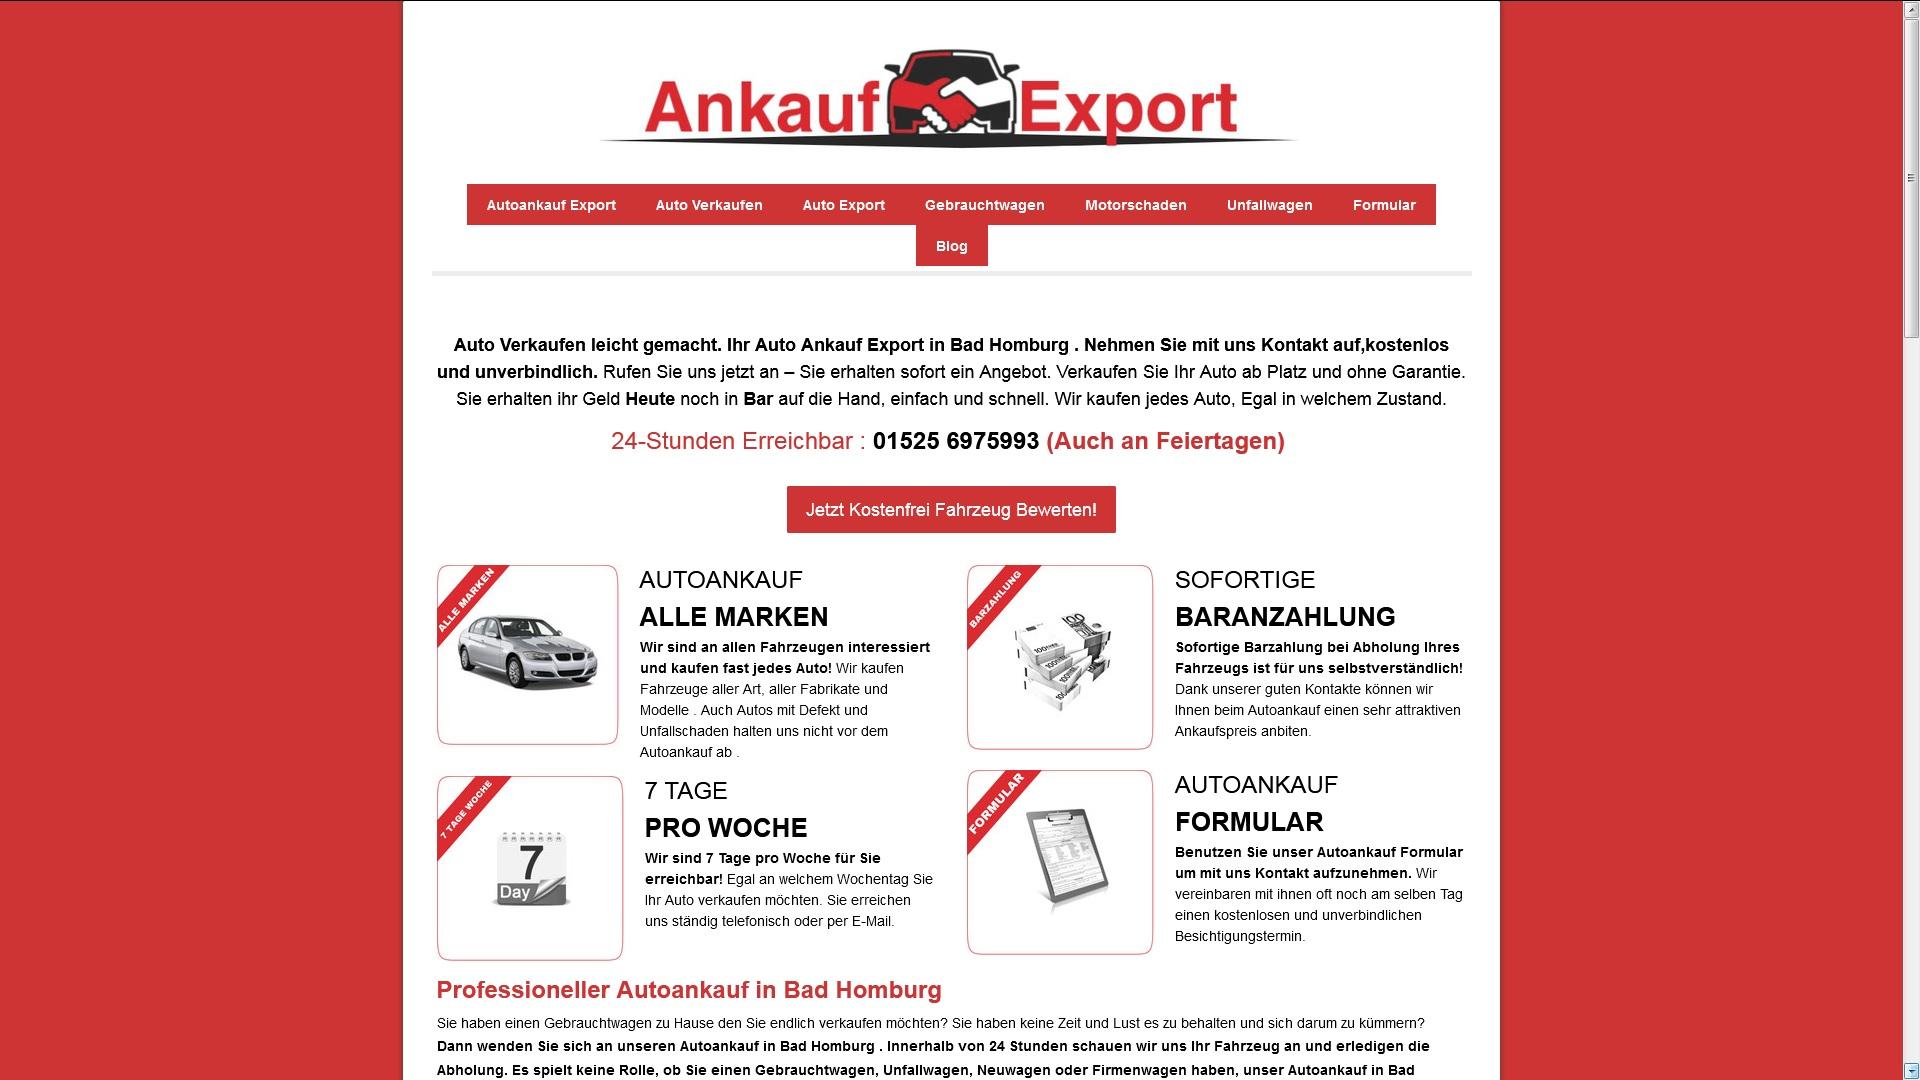 Autoankauf Duisburg